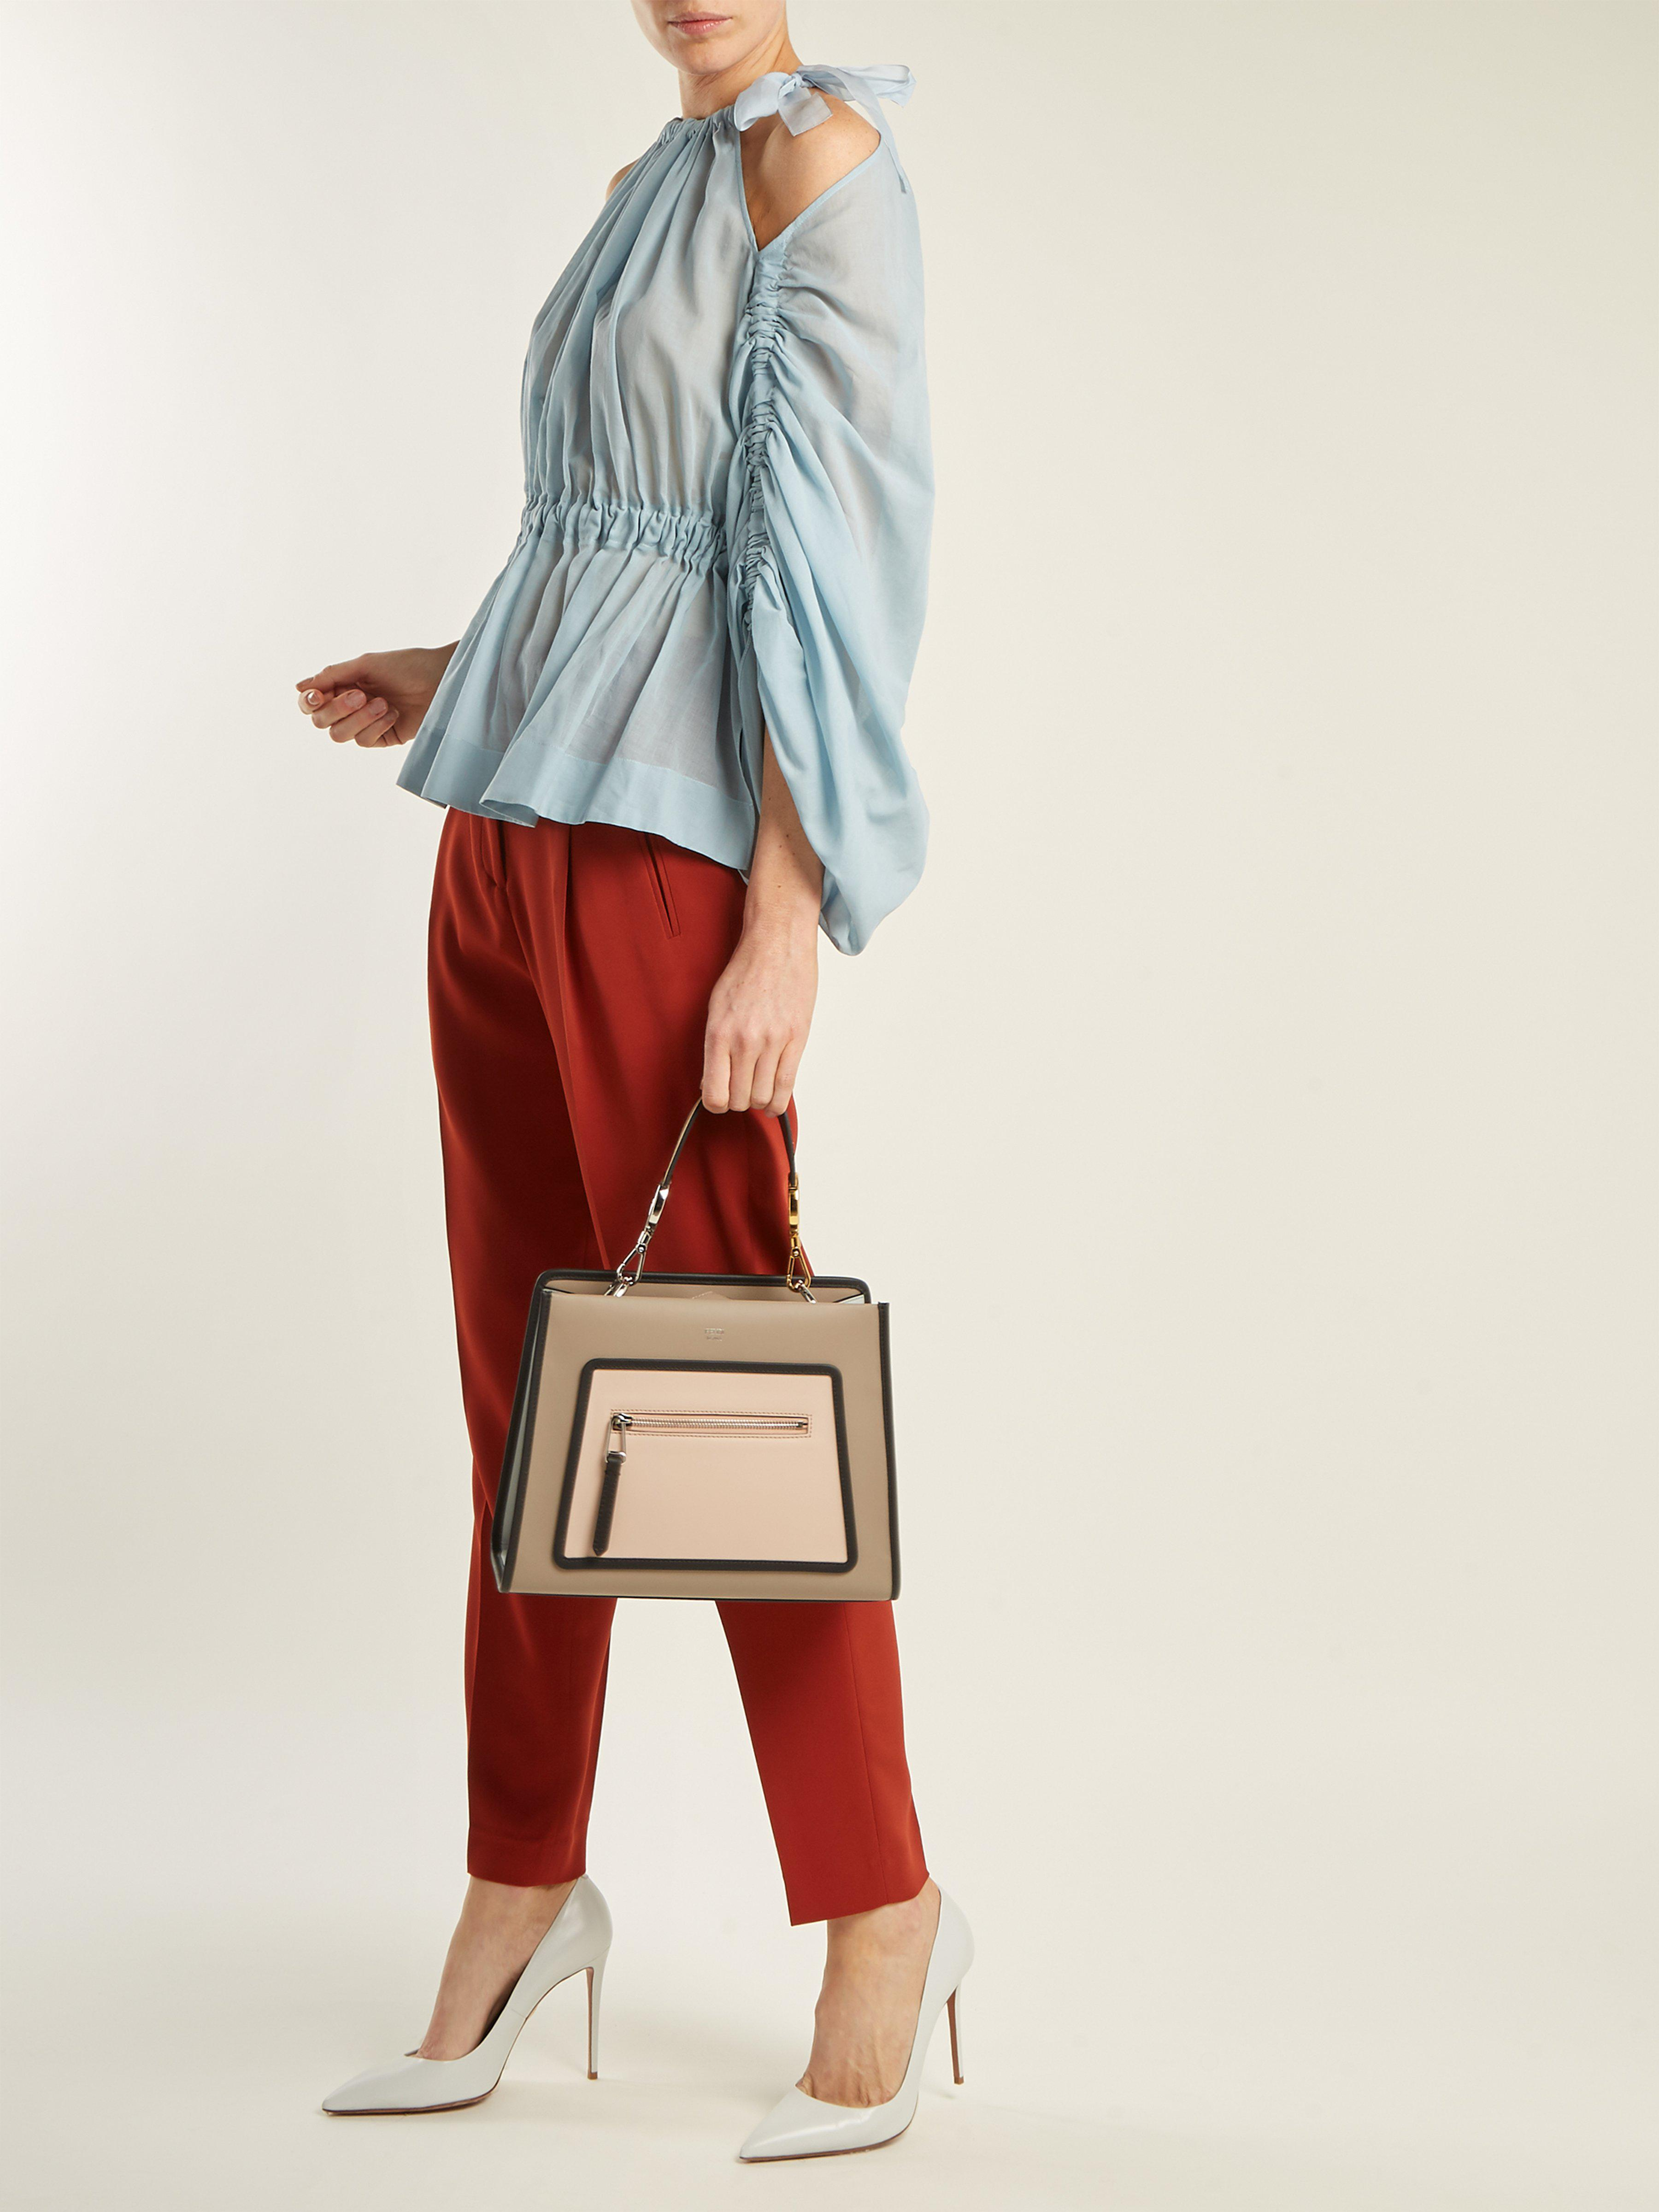 Fendi - Multicolor Runaway Leather Tote Bag - Lyst. View fullscreen 0834ef820e774